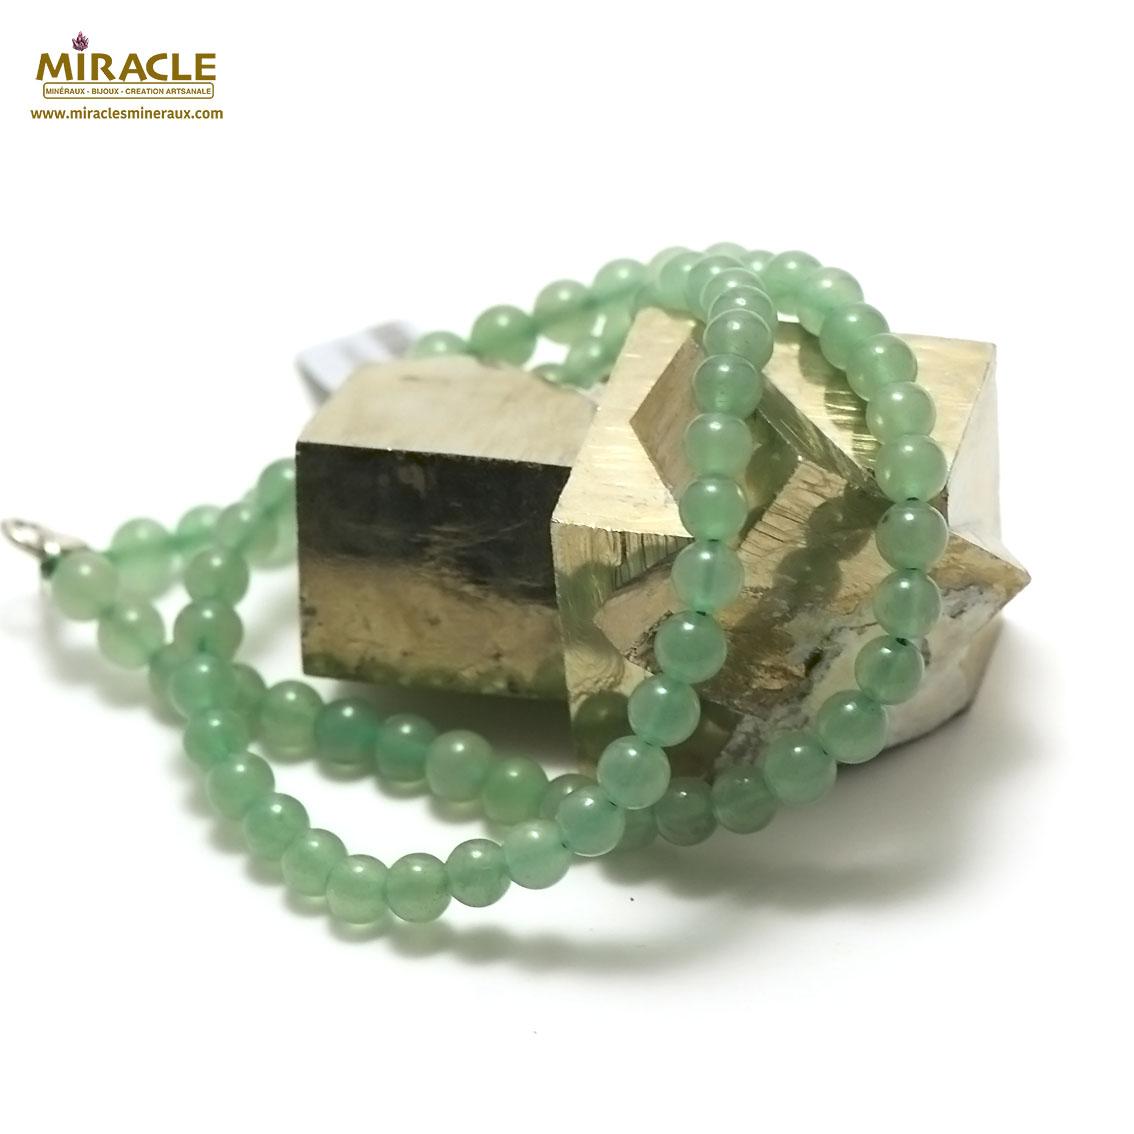 collier aventurine perle ronde 6 mm